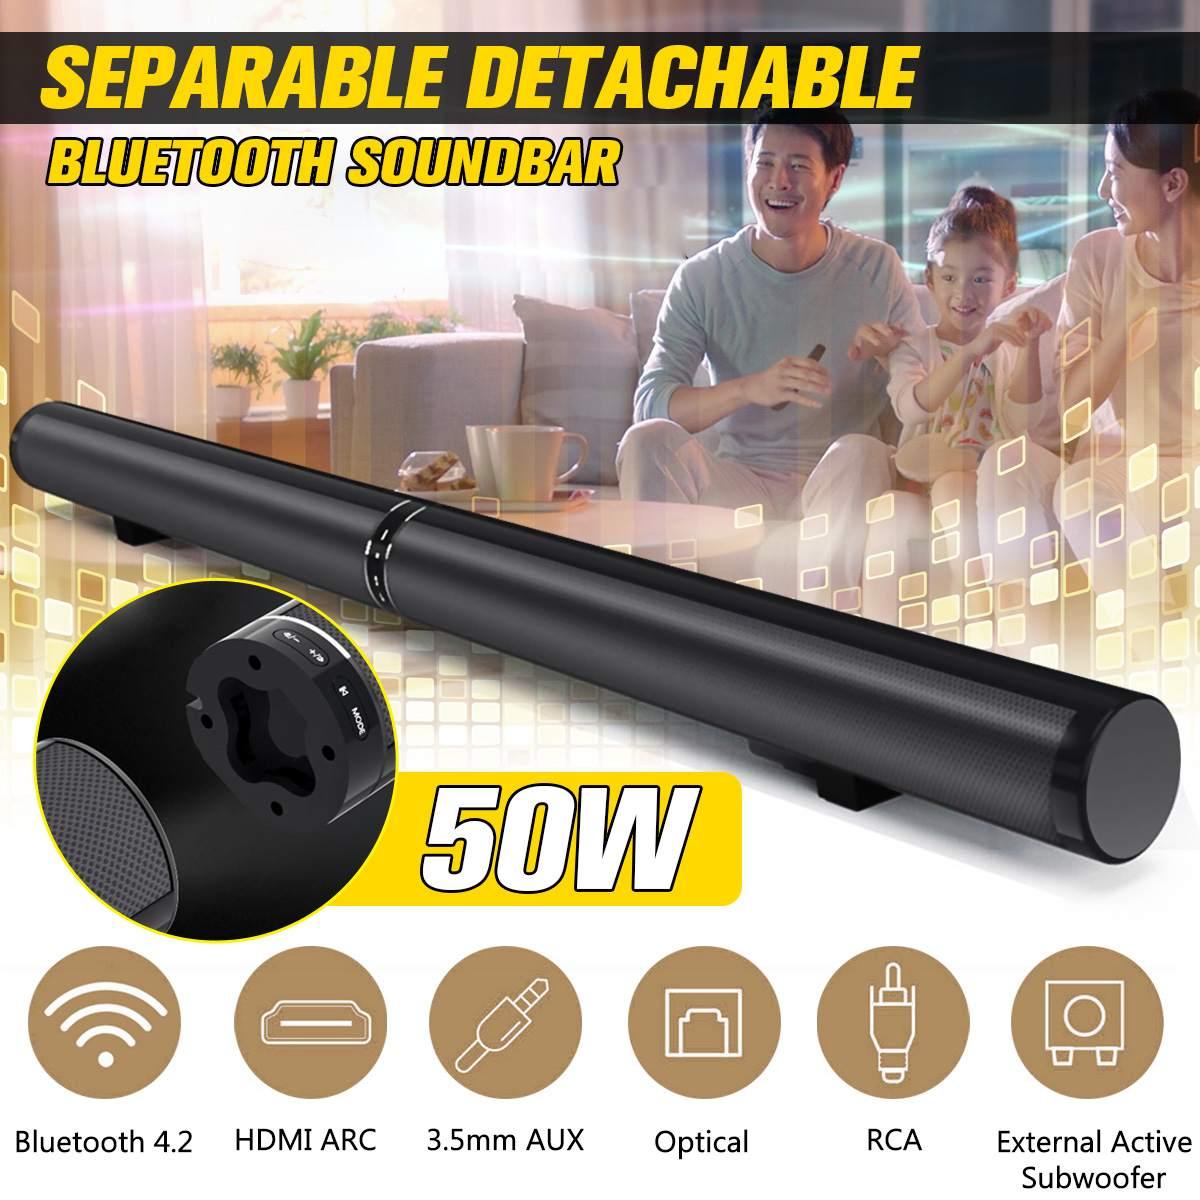 50W Detachable Wireless bluetooth <font><b>Speaker</b></font